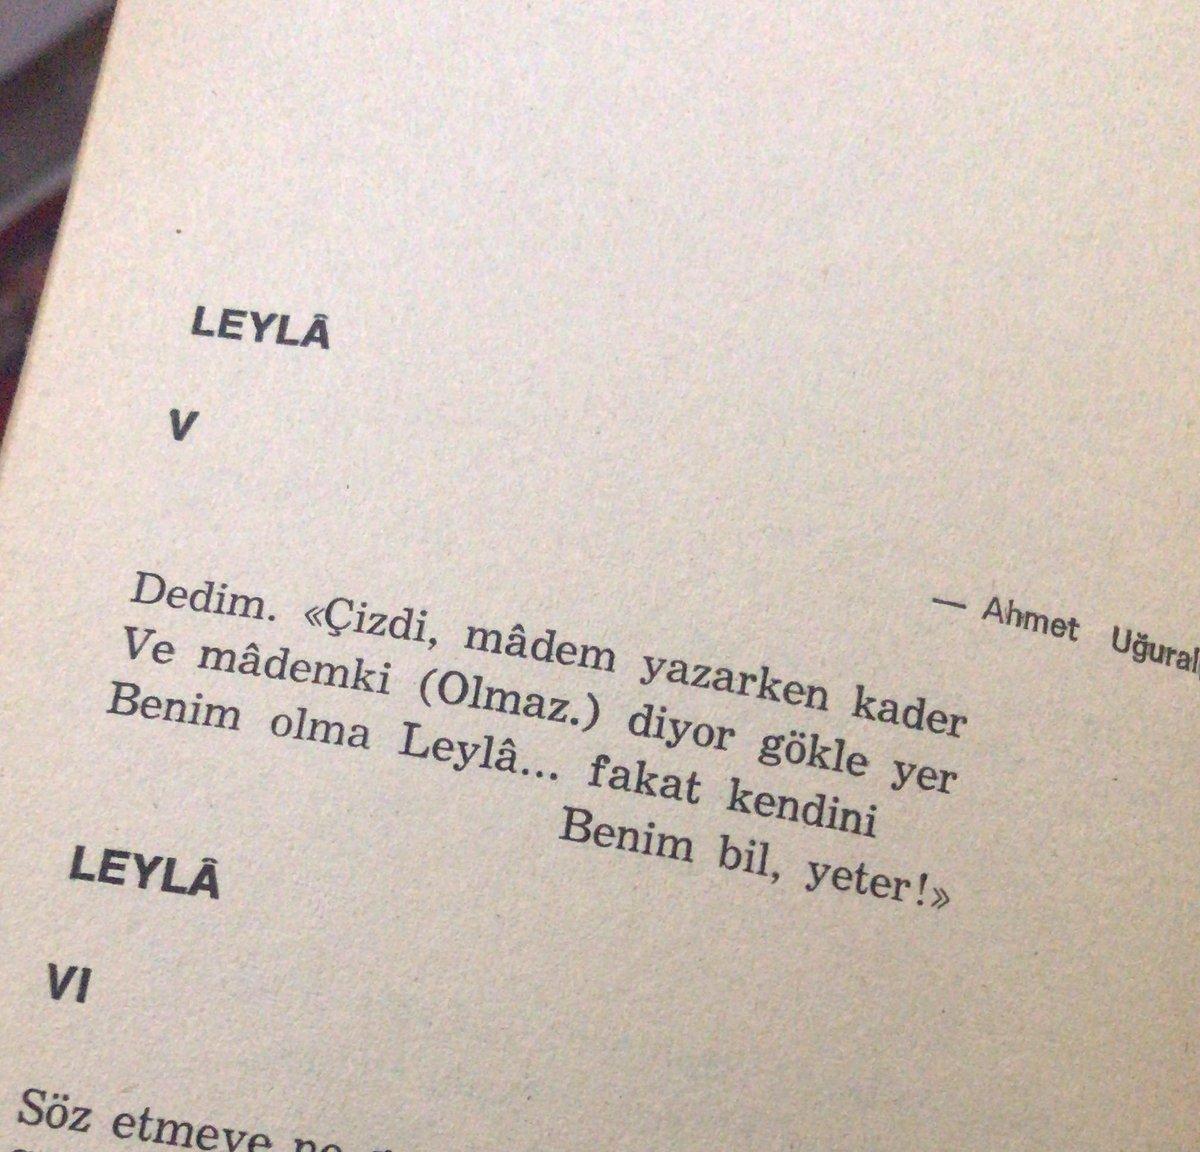 Benim olma Leylâ... fakat kendini                                   Benim bil, yeter!  @ustatasya  #arifnihatasya